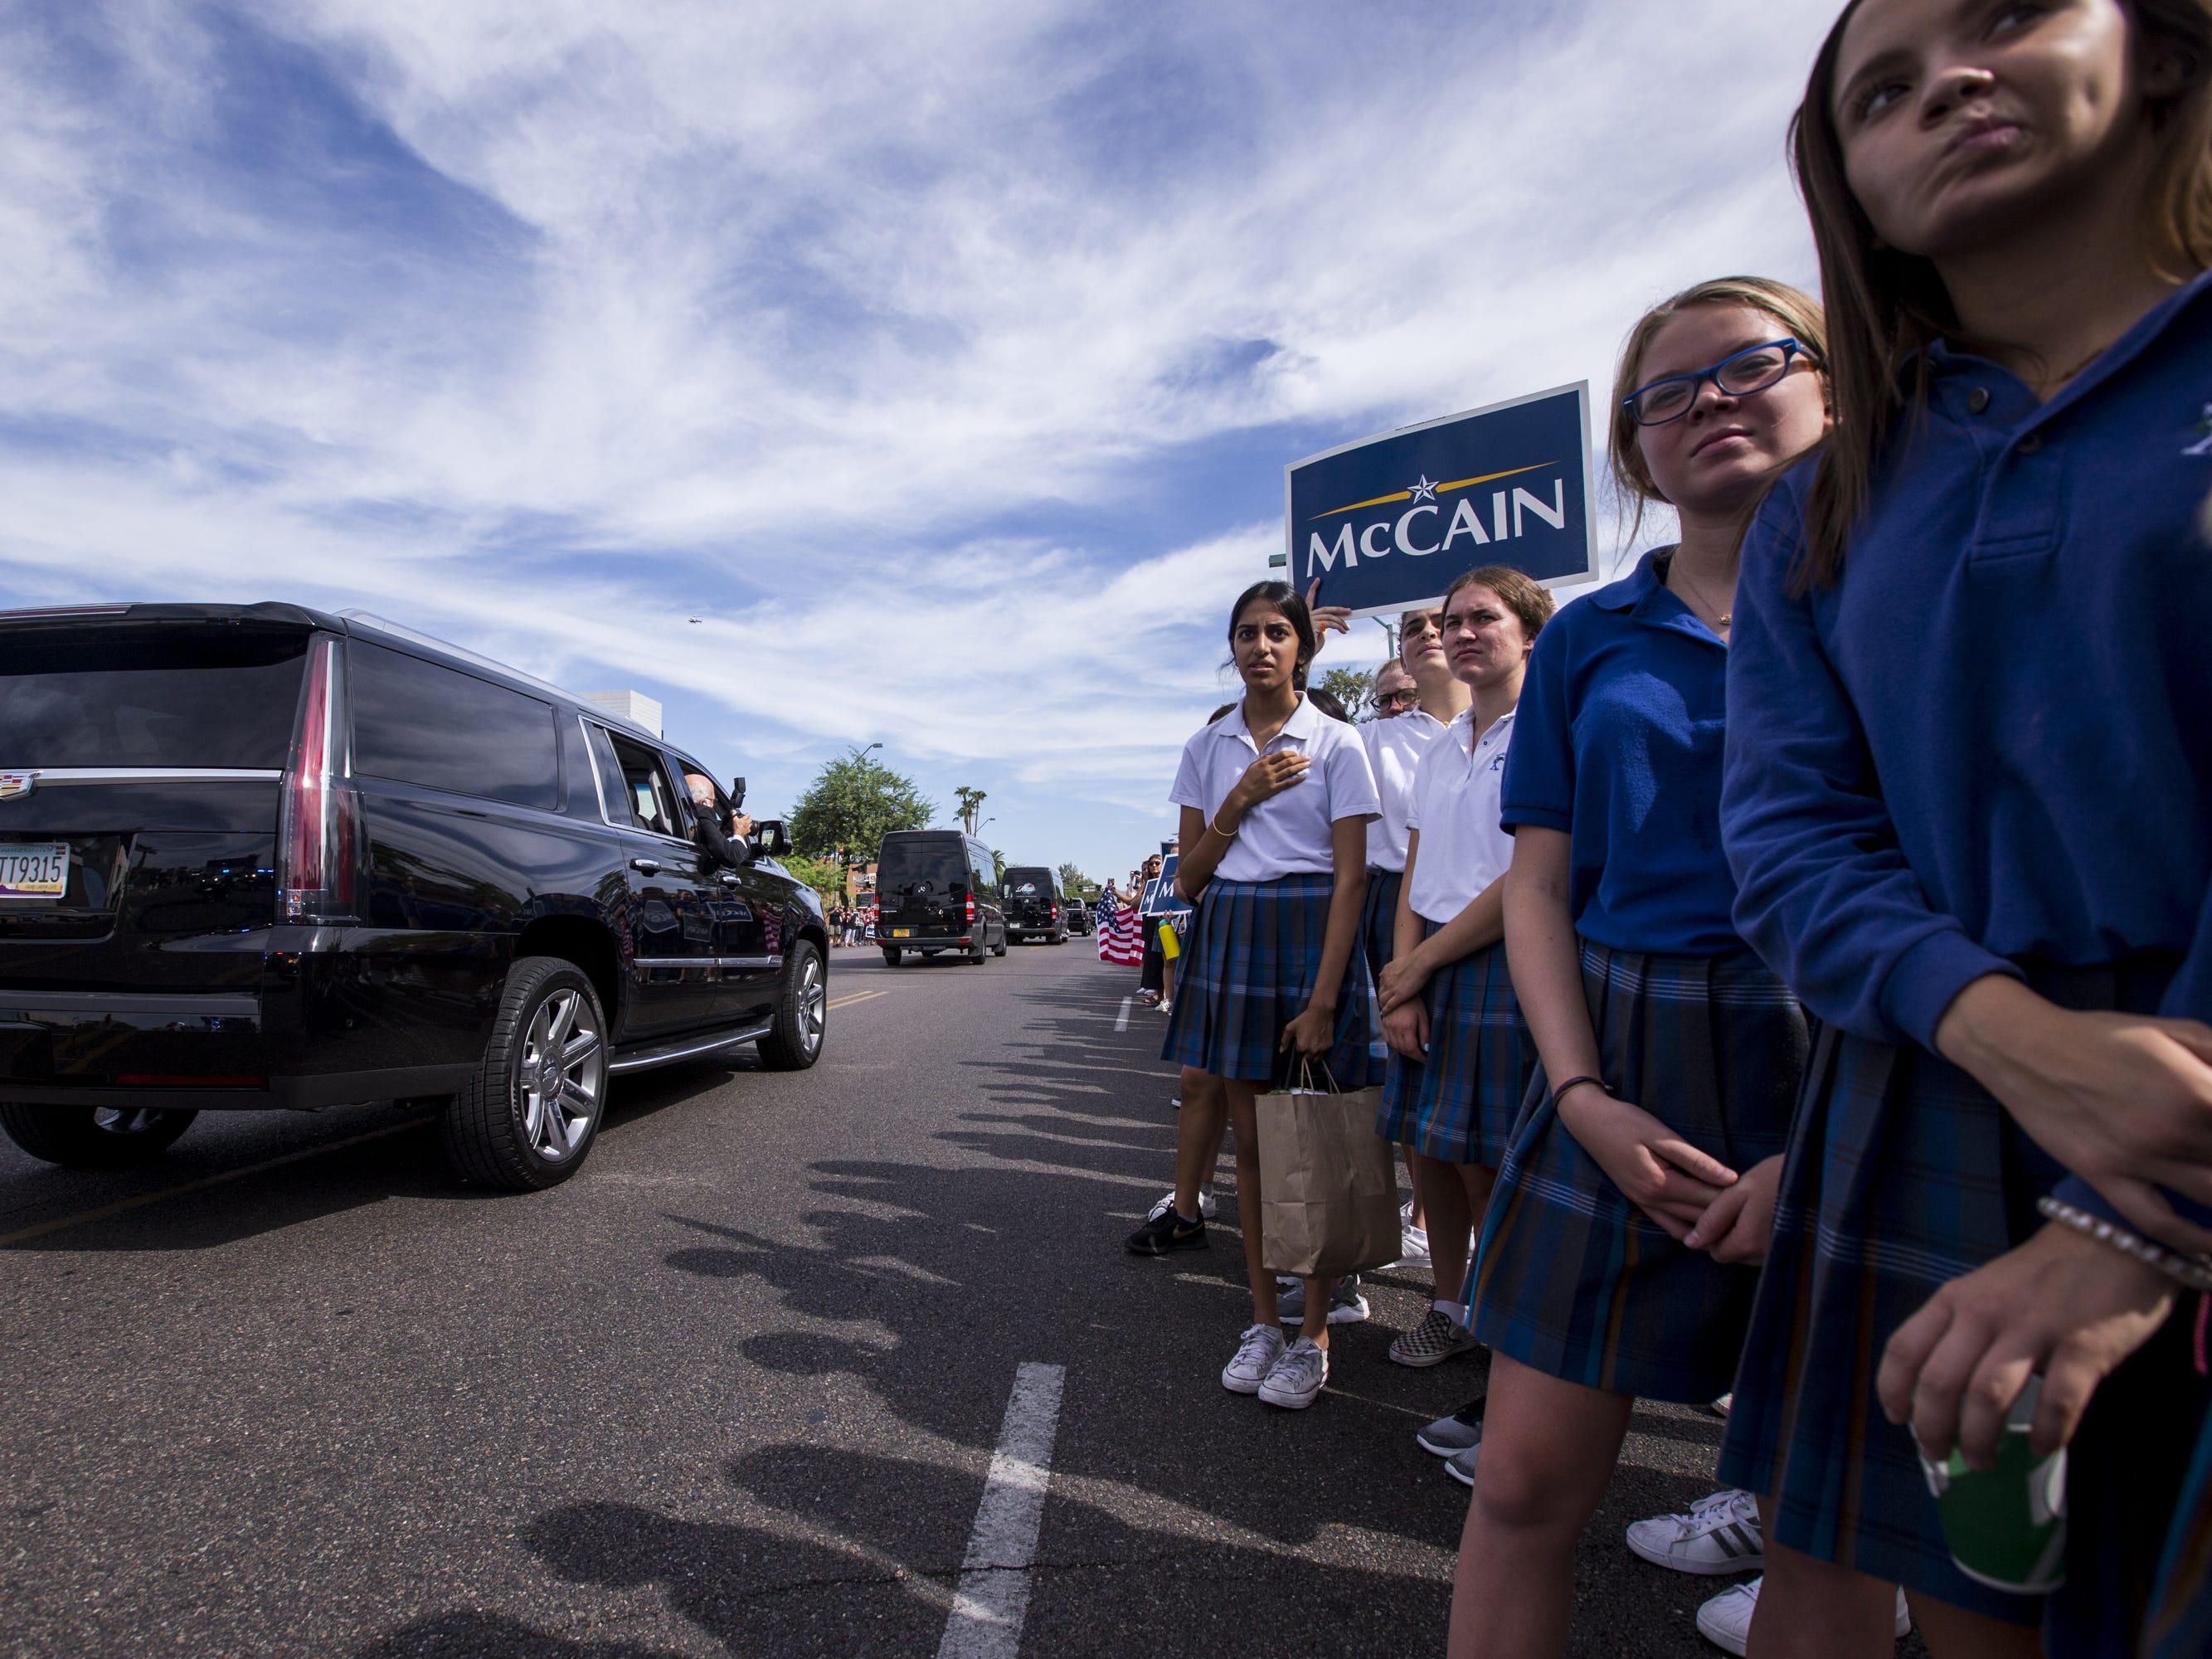 Xavier students watch as Sen. John McCain's motorcade passes by on the way to his Arizona Memorial Service at North Phoenix Baptist Church on Thursday, Aug. 30, 2018, in Phoenix.